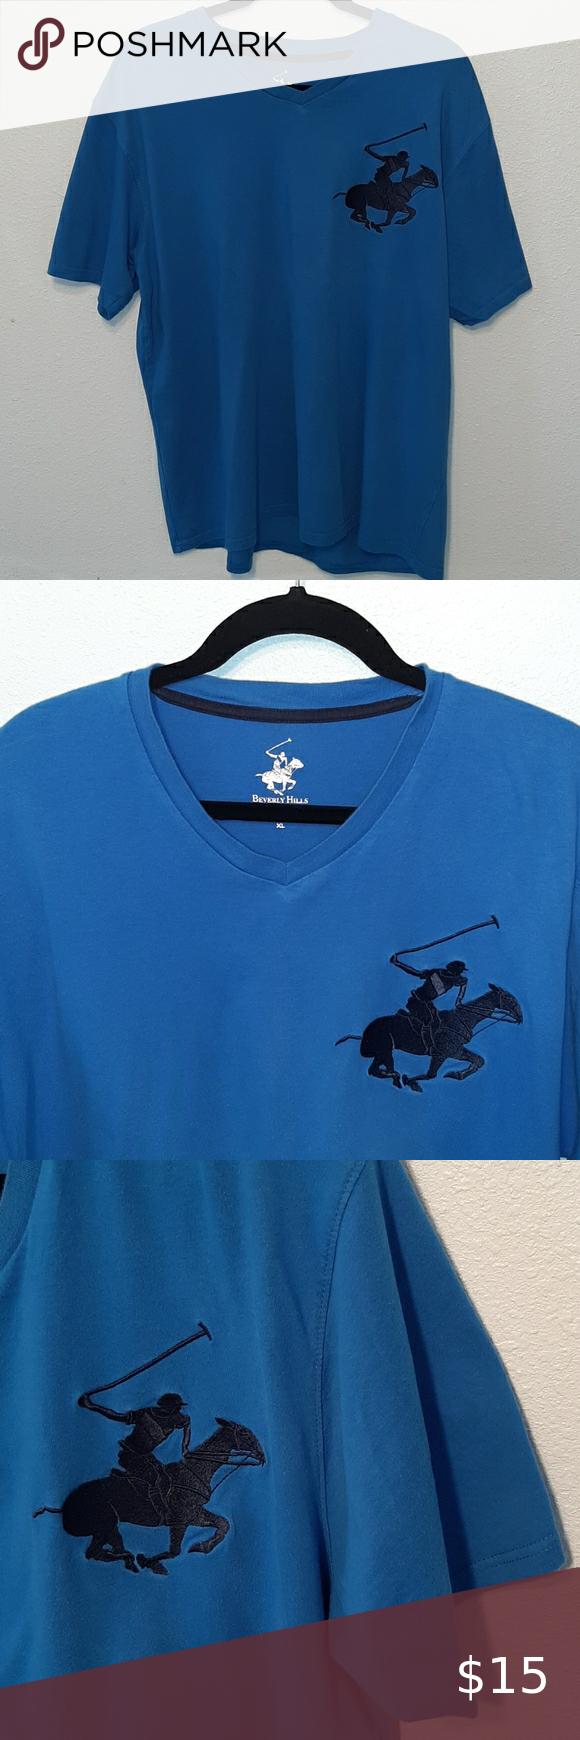 Beverly Hills Polo Club Men S Shirt Size Xl Beverly Hills Polo Club Polo Club Mens Shirts